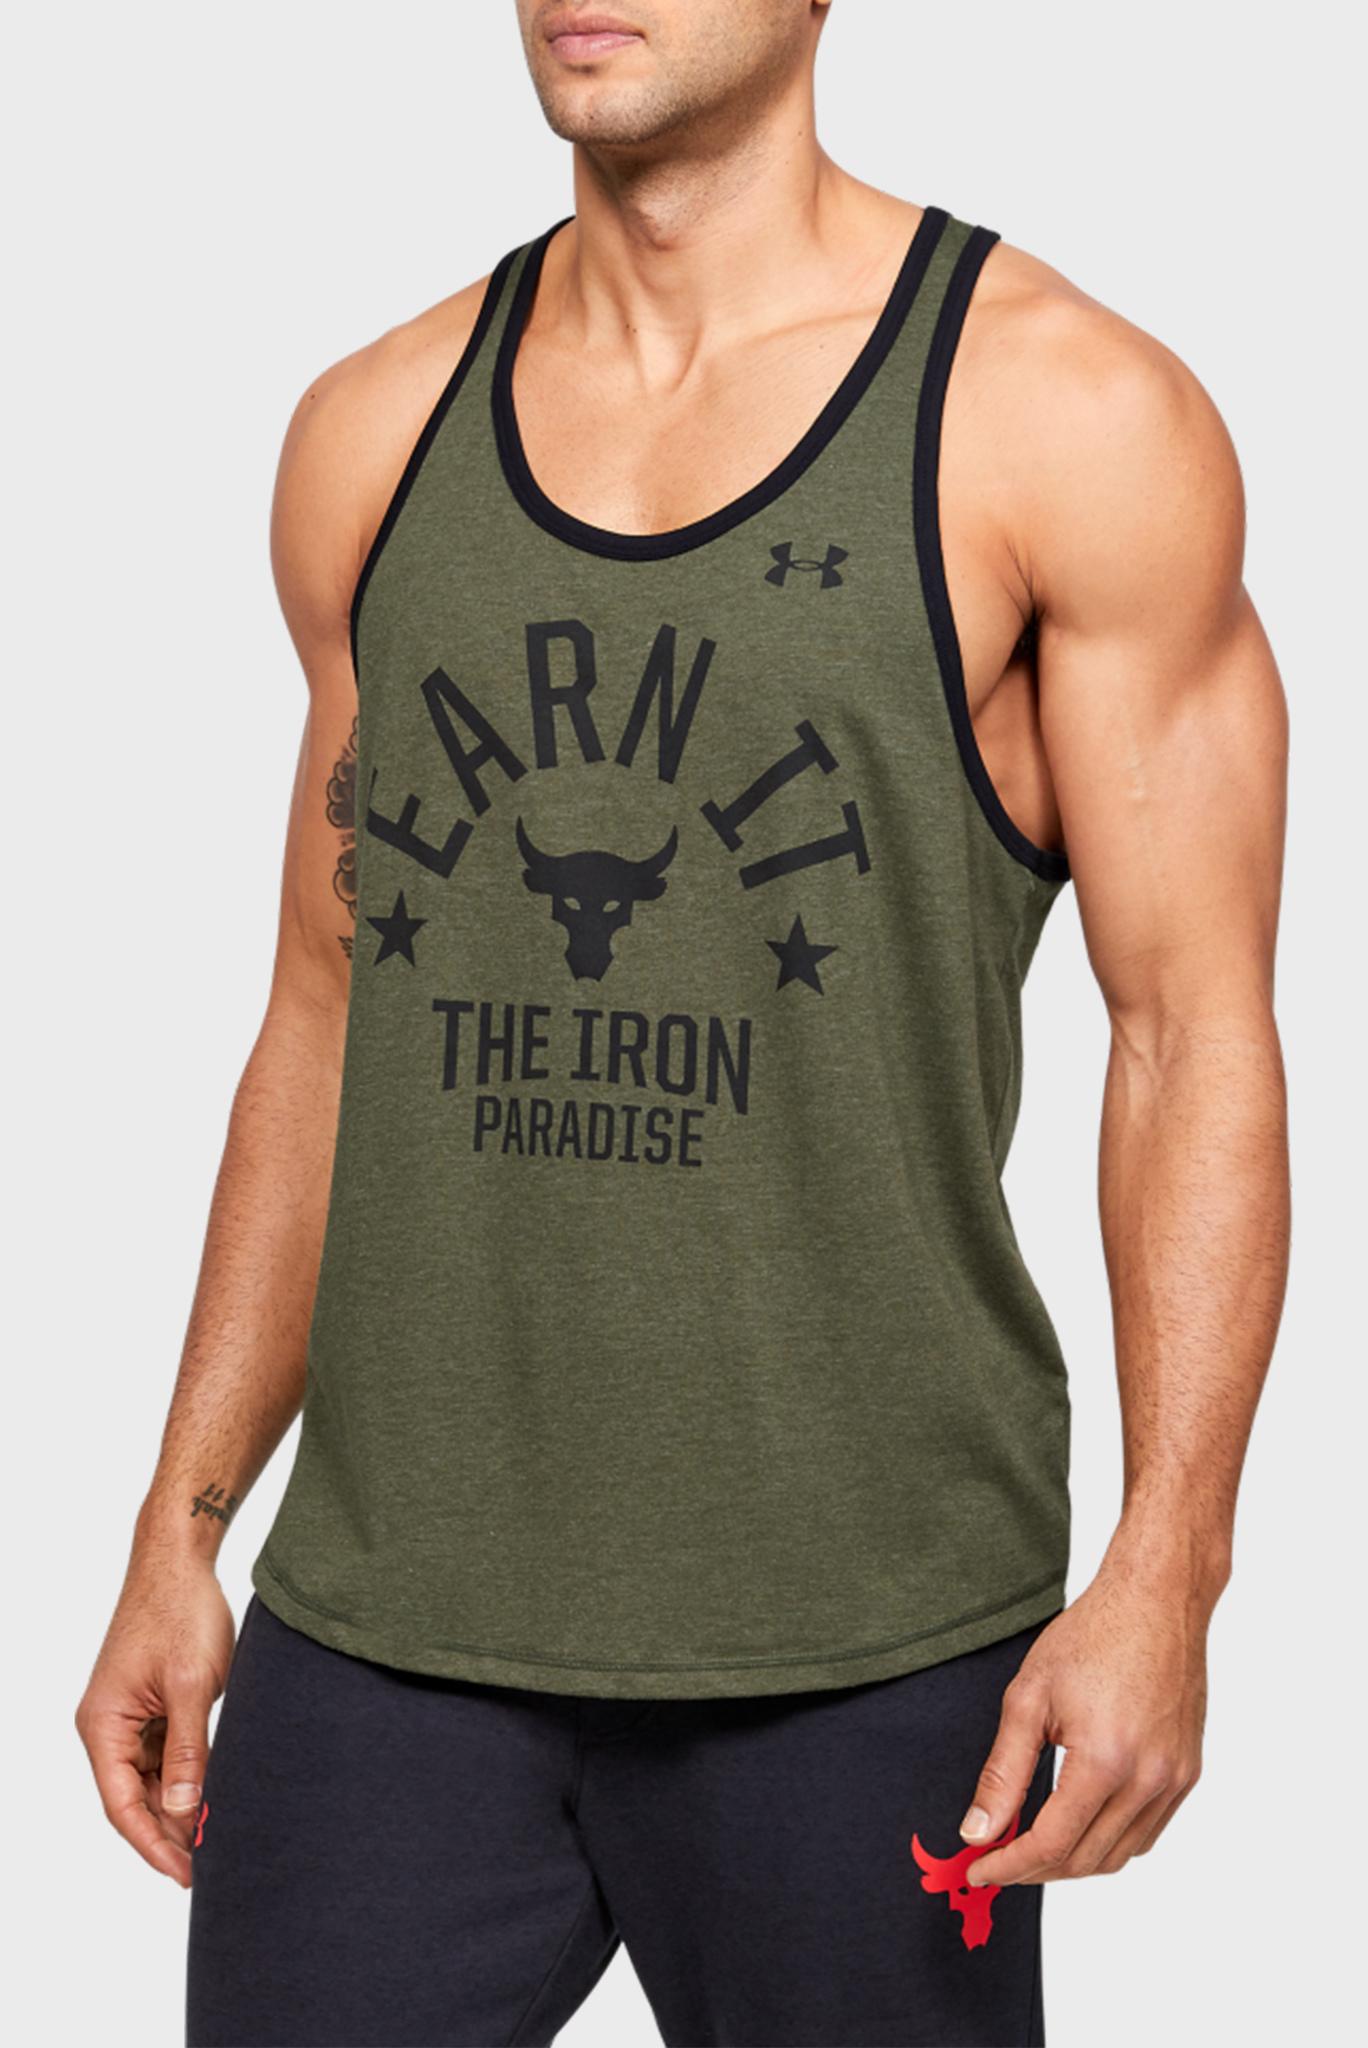 Мужская зеленая спортивная футболка UA Pjt Rock Iron Paradise Tk Under Armour